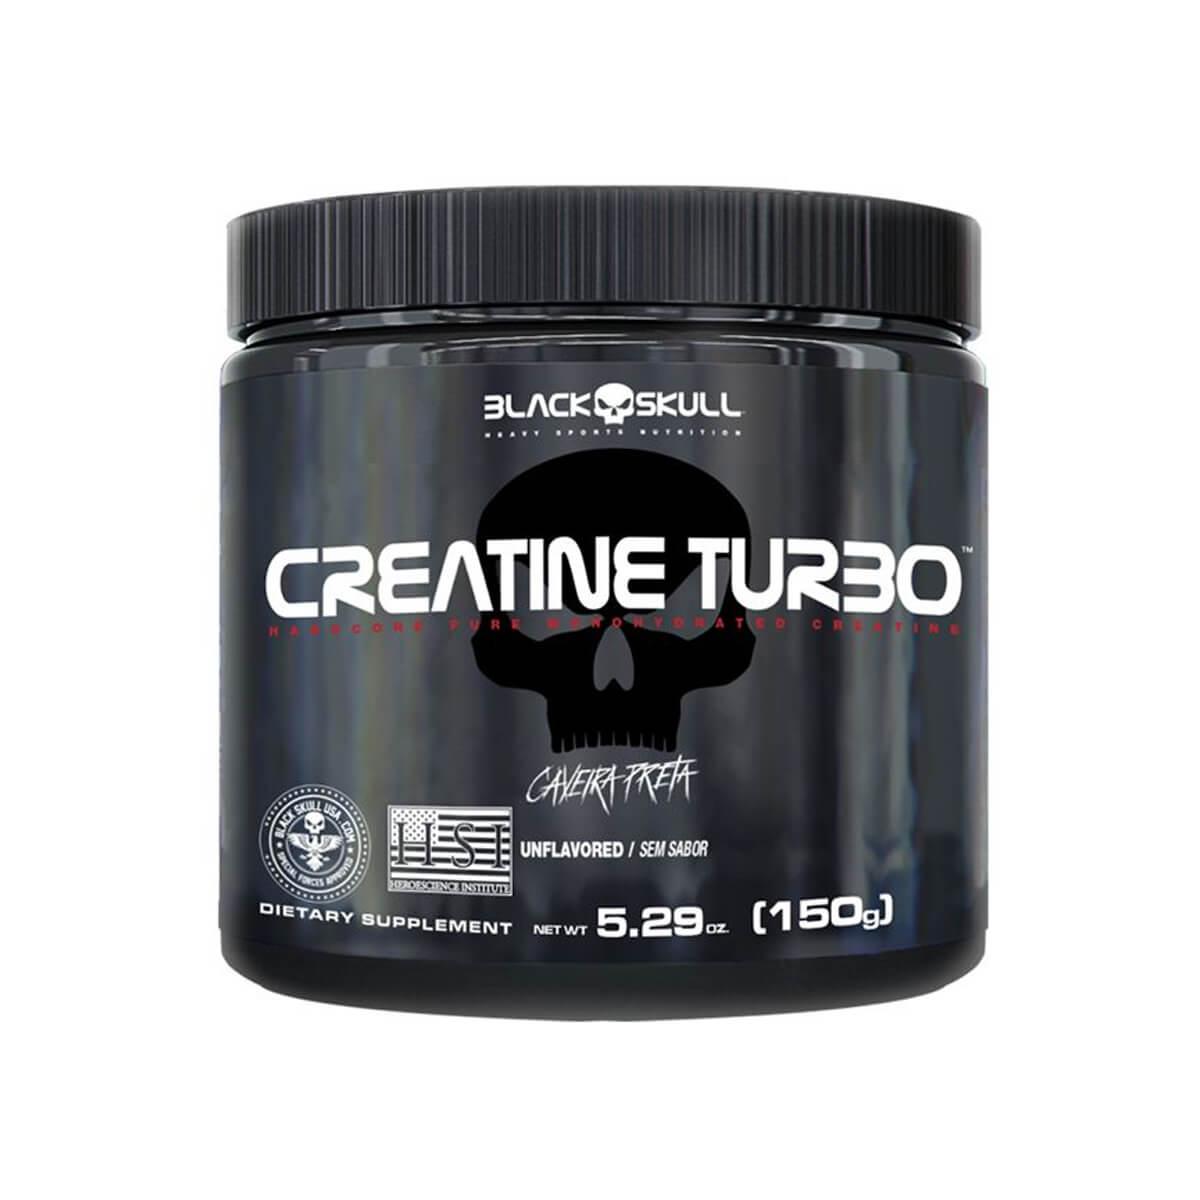 Creatine Turbo - 150g - Black Skull